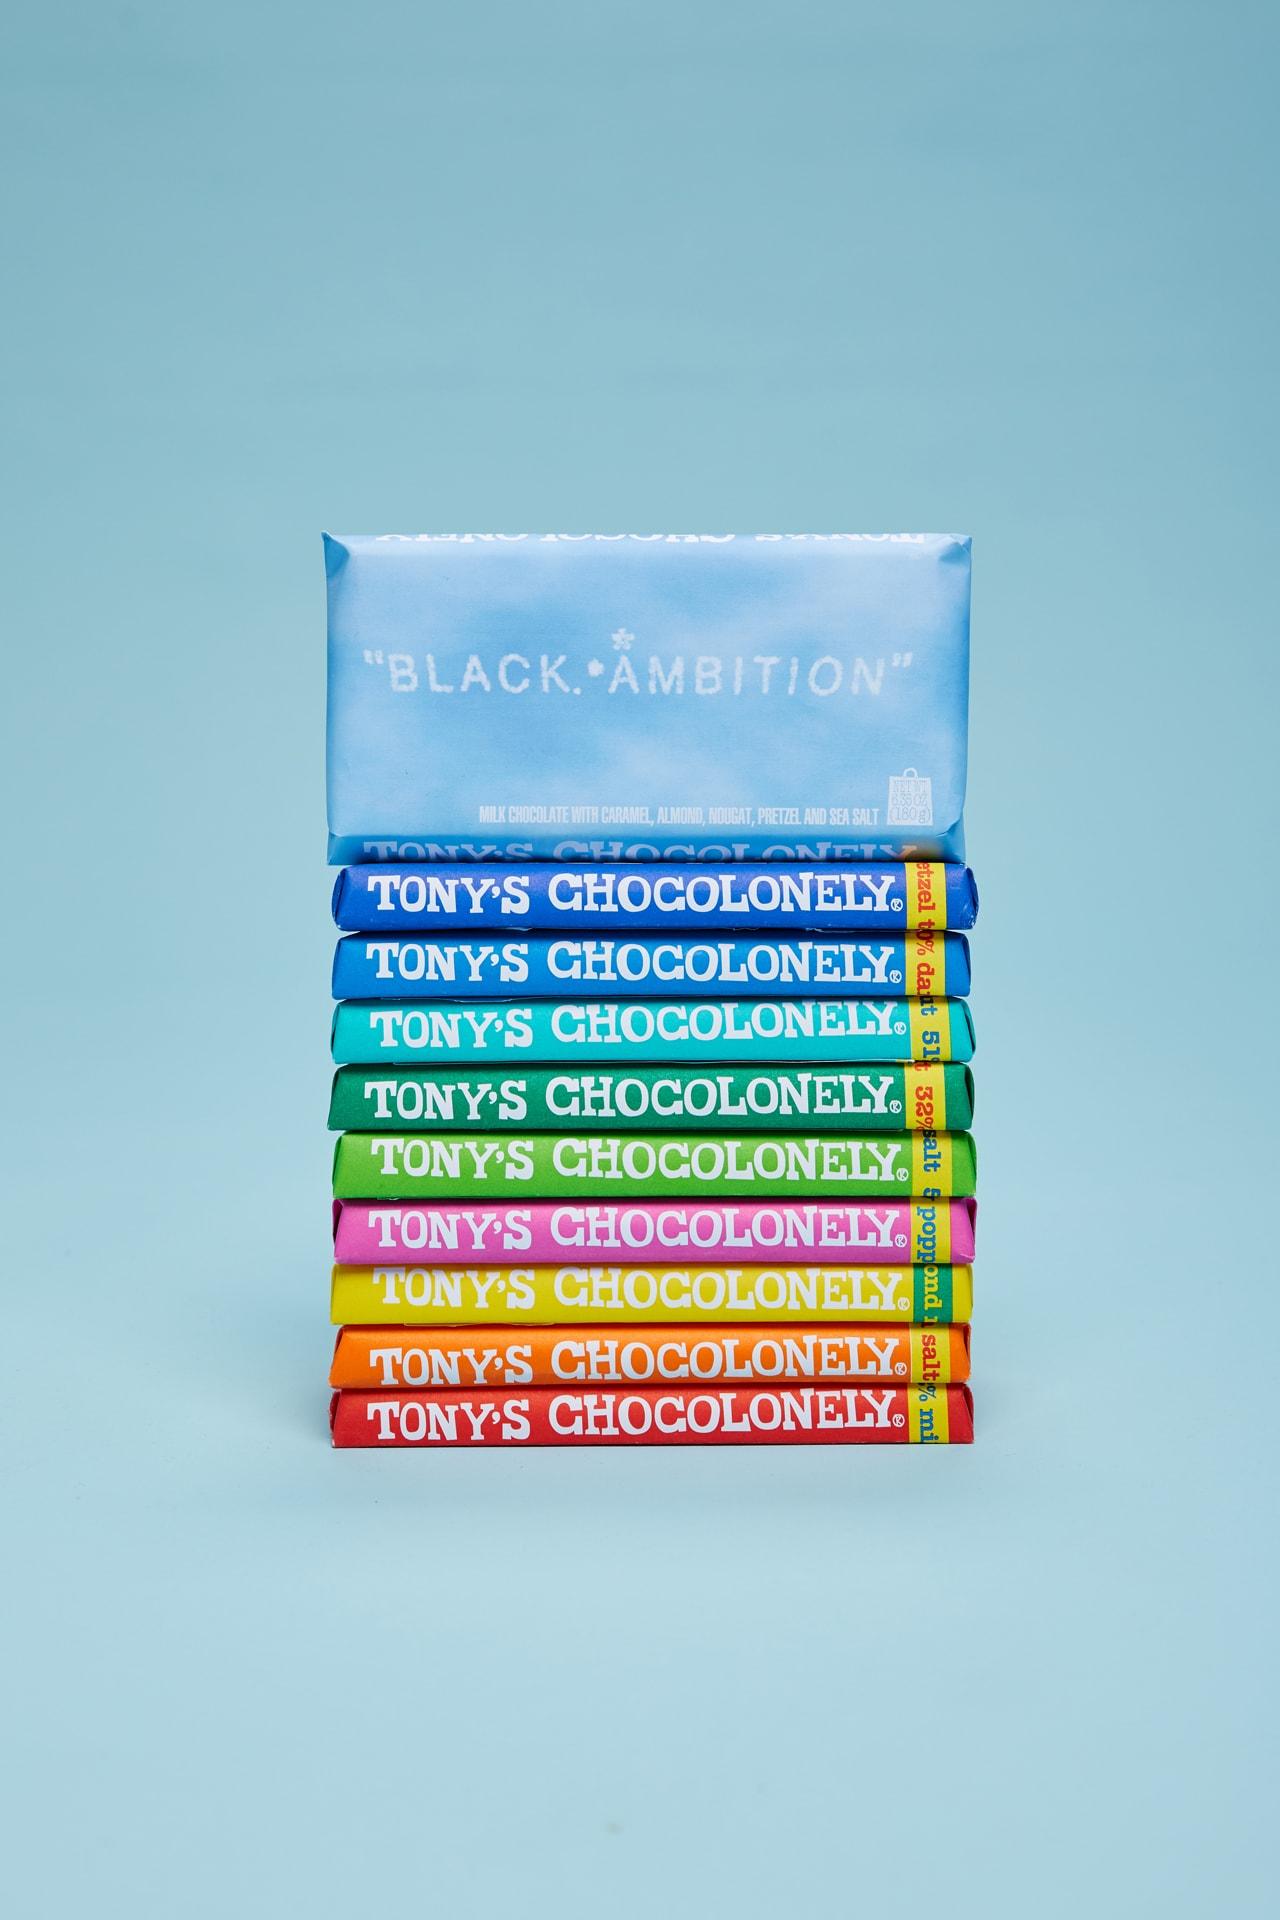 Tony's Chocolonely Pharrell Black Ambition program non-profit initiative